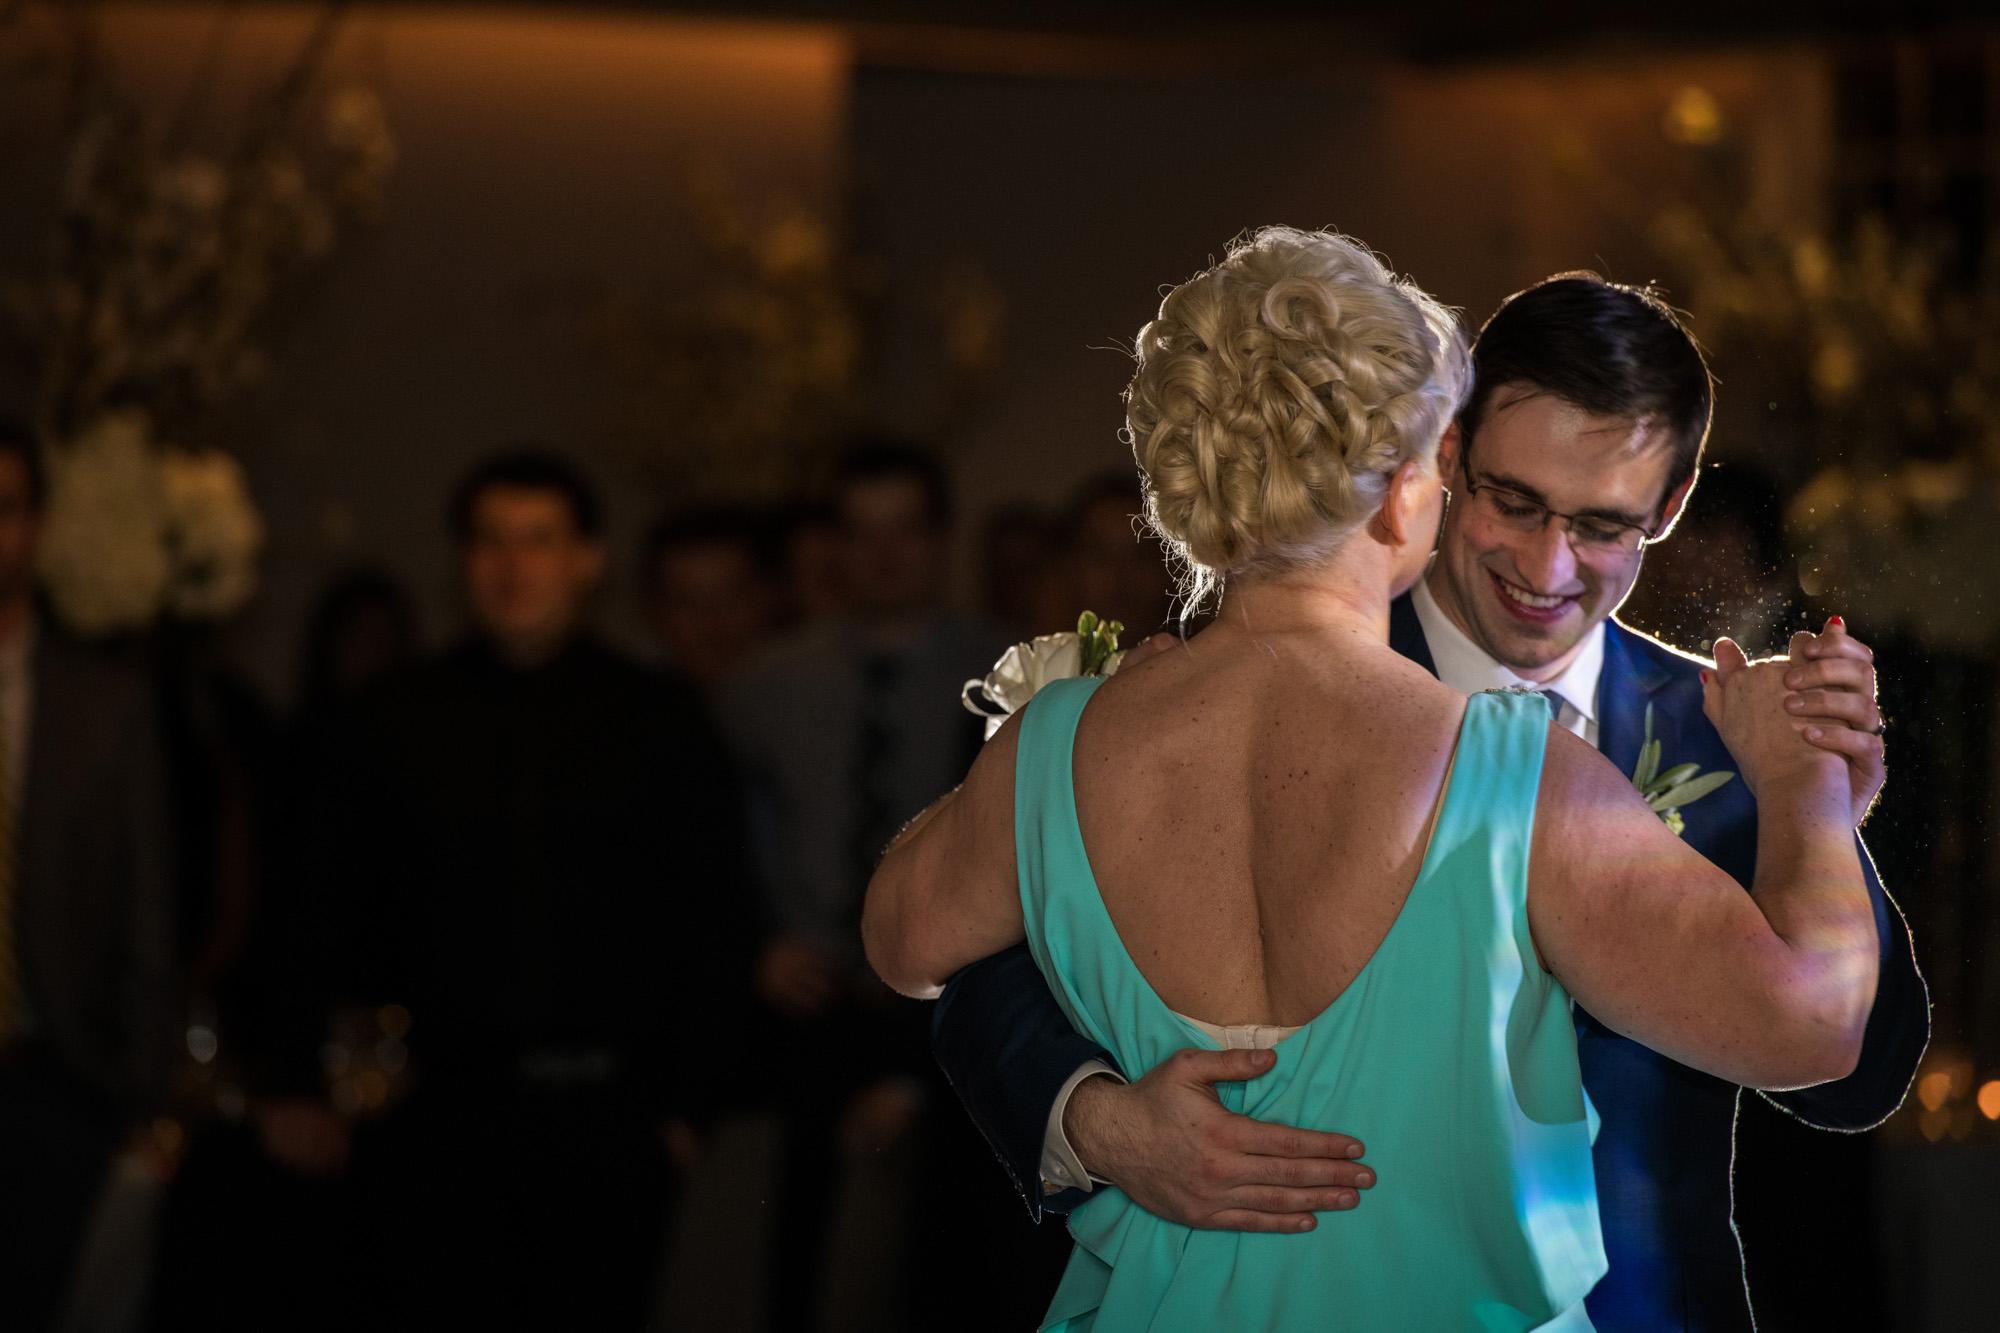 nj-wedding-photographer-maritime-parc-maria-david-48.jpg